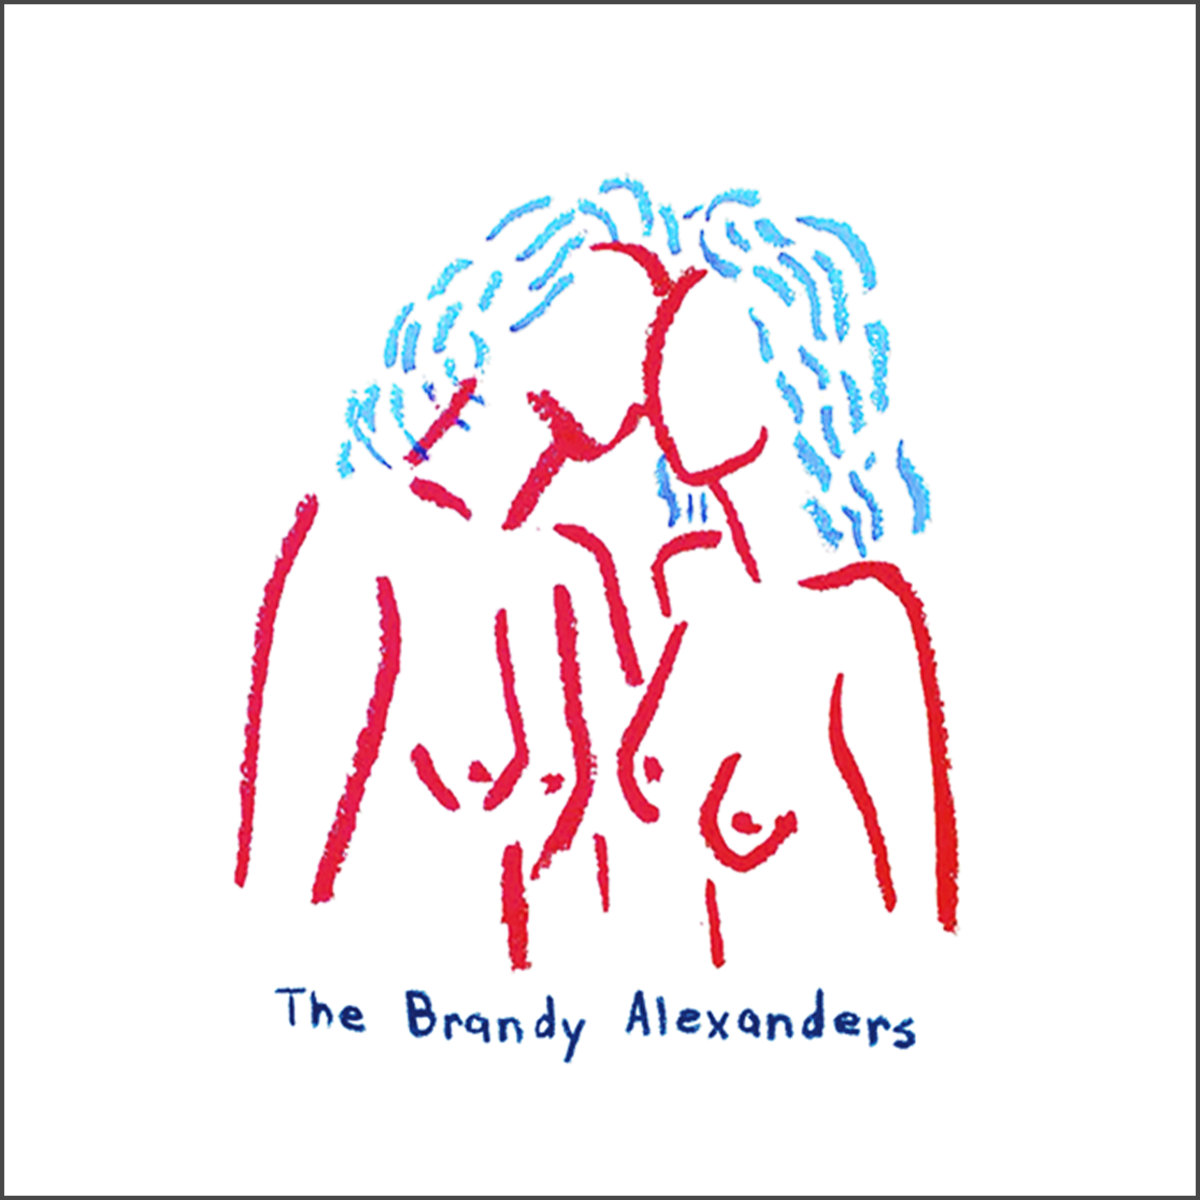 The Brandy Alexanders - S/T EP